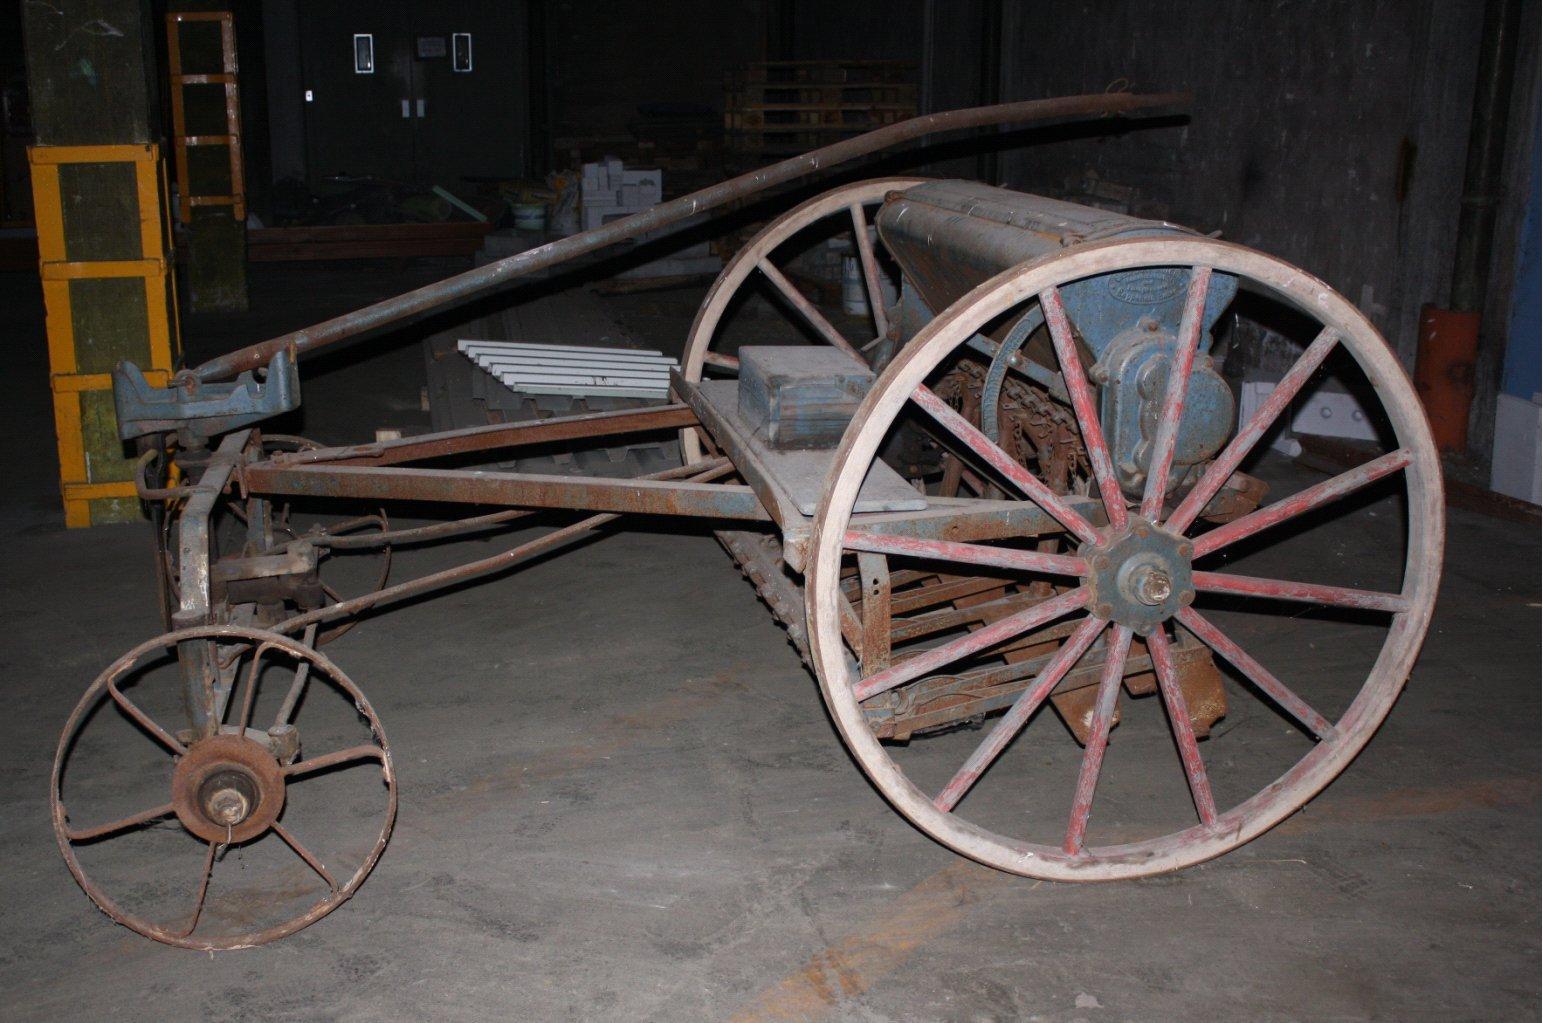 Sähmaschine um 1900-1